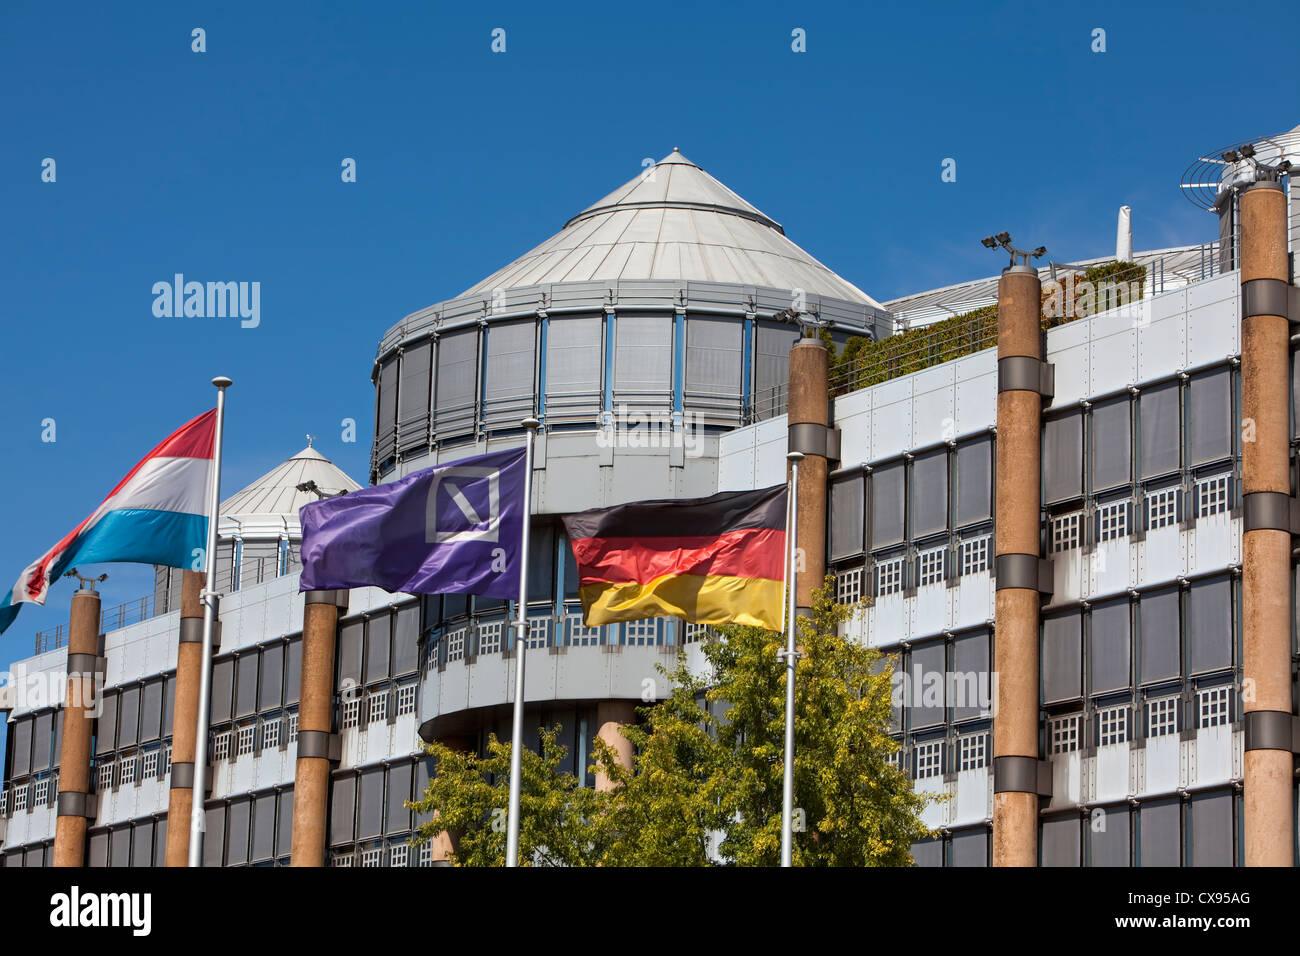 Deutsche Bank Gebäude, Viertel Kirchberg, Luxemburg-Stadt, Europa Stockbild